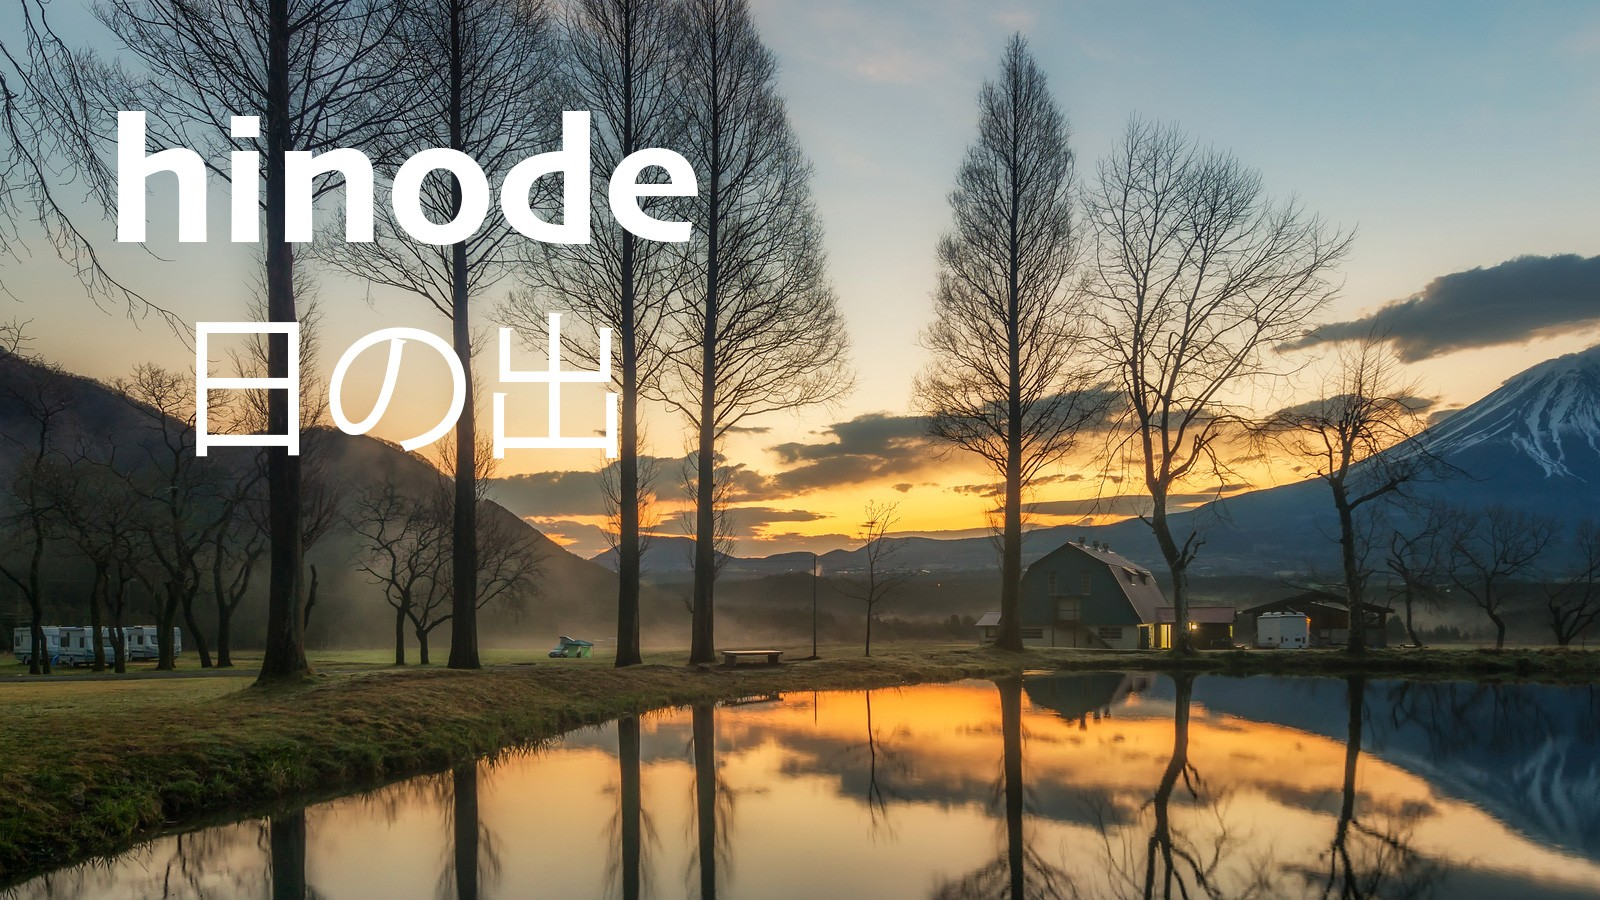 beautiful japanese word hinode meaning sunrise